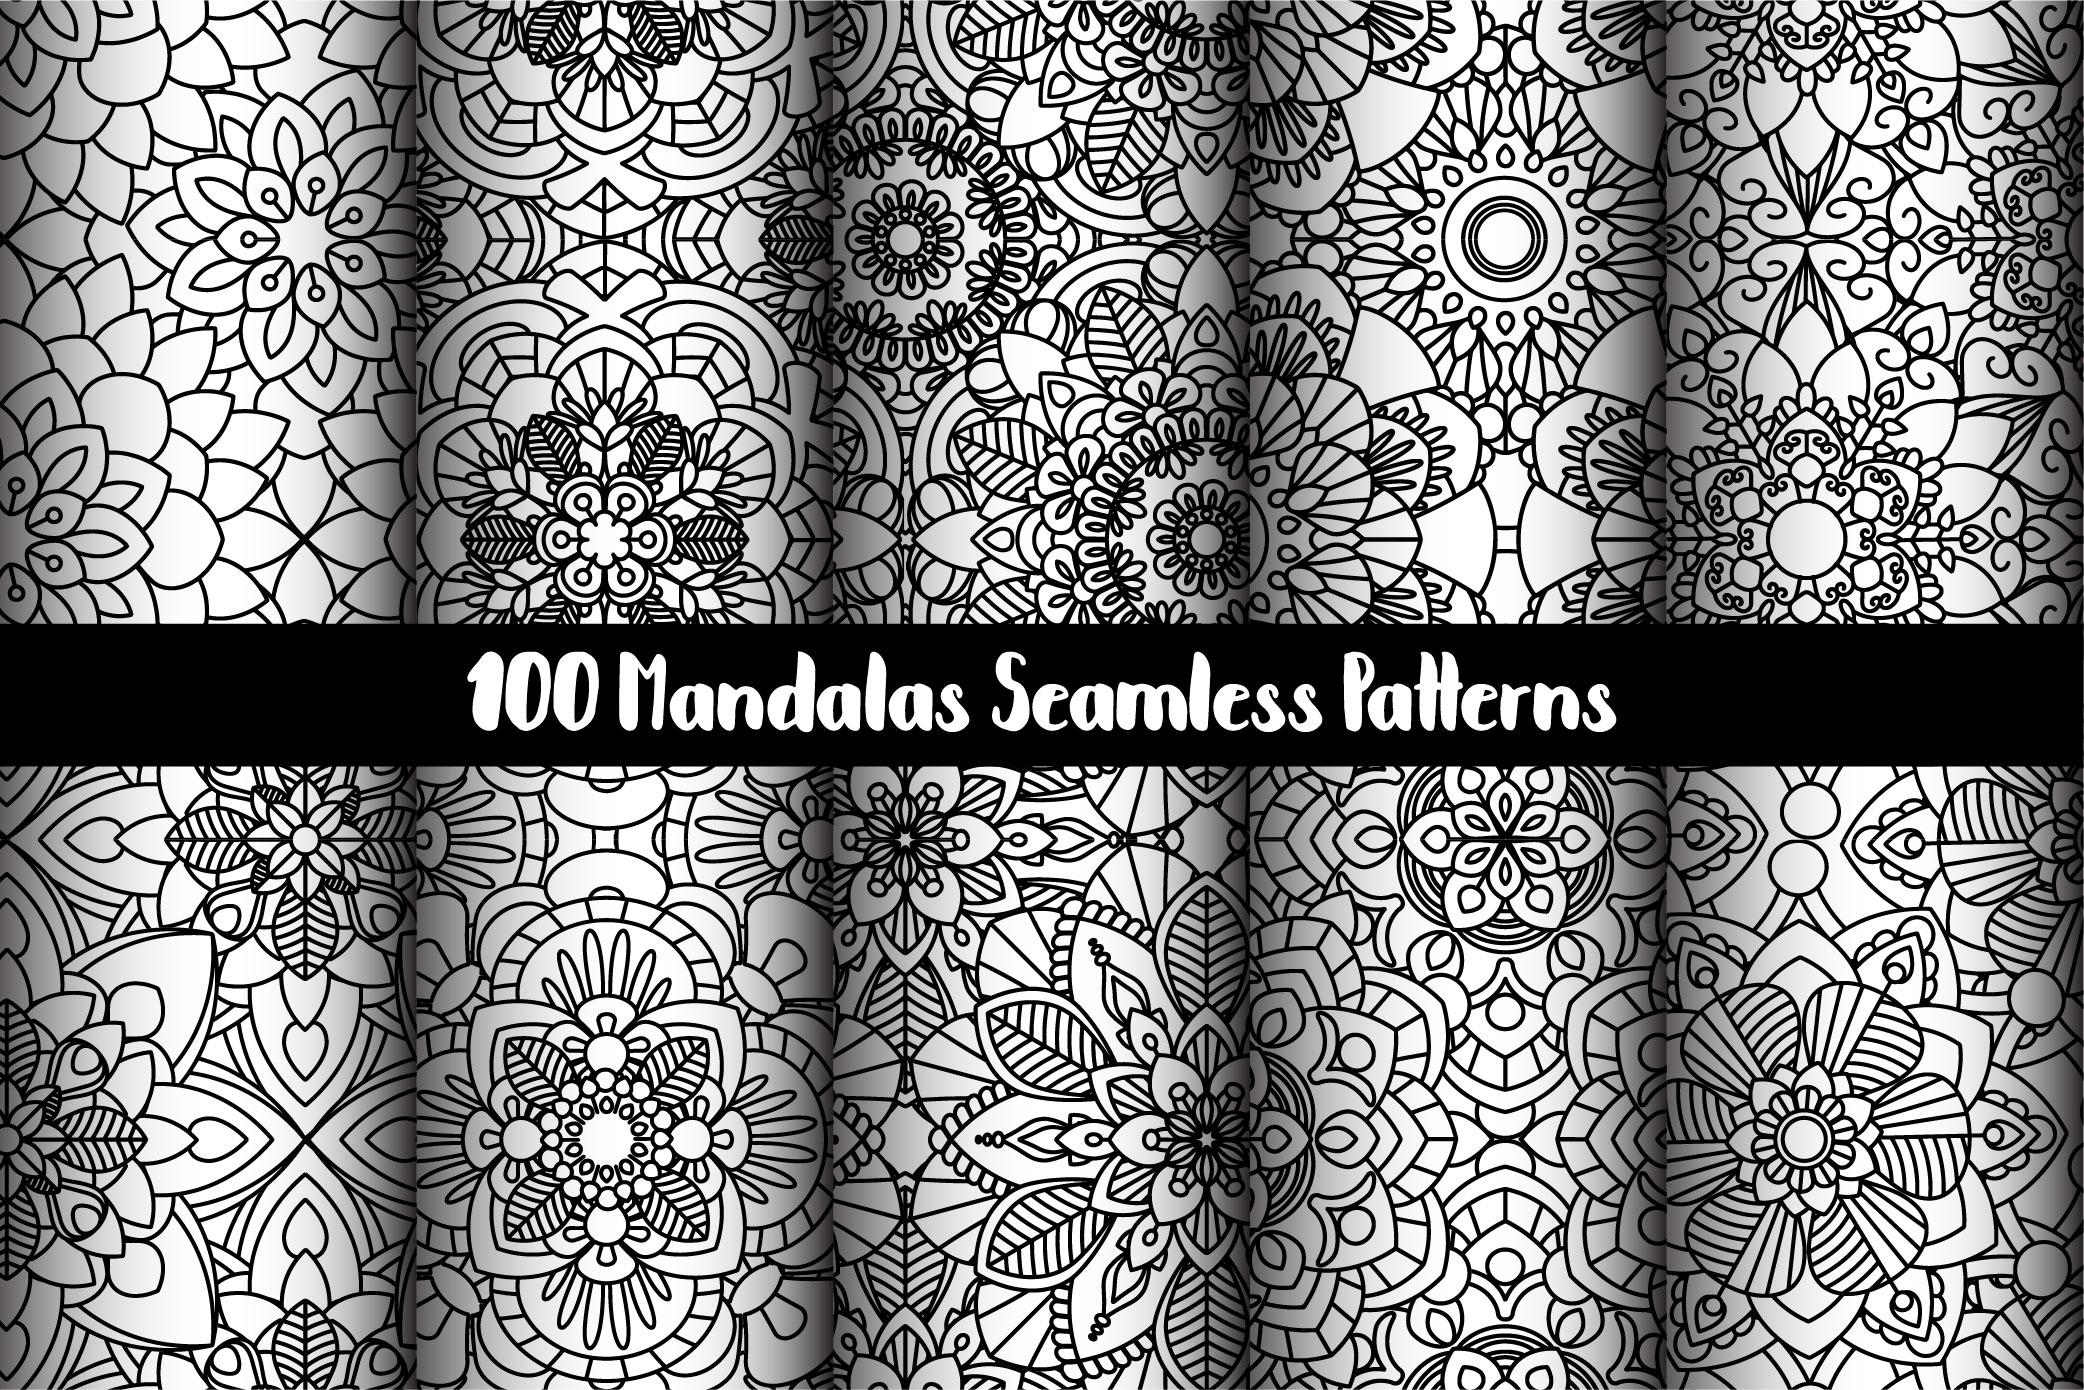 100 Mandalas Seamless Patterns example image 13